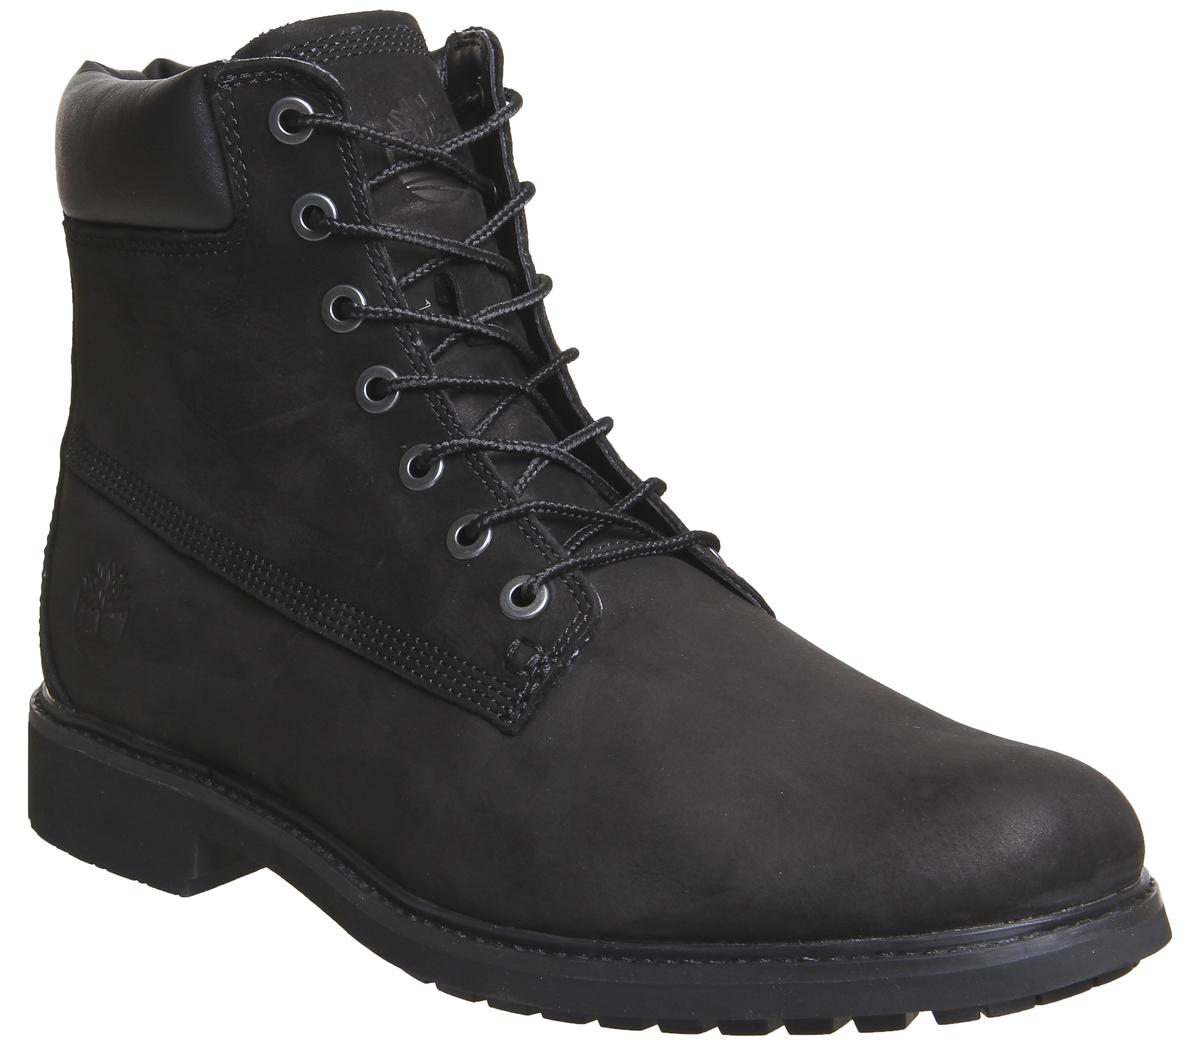 Hombre-TIMBERLAND-Hombre-Entallado-15-2cm-Botas-Negras-NOBUK-Botas